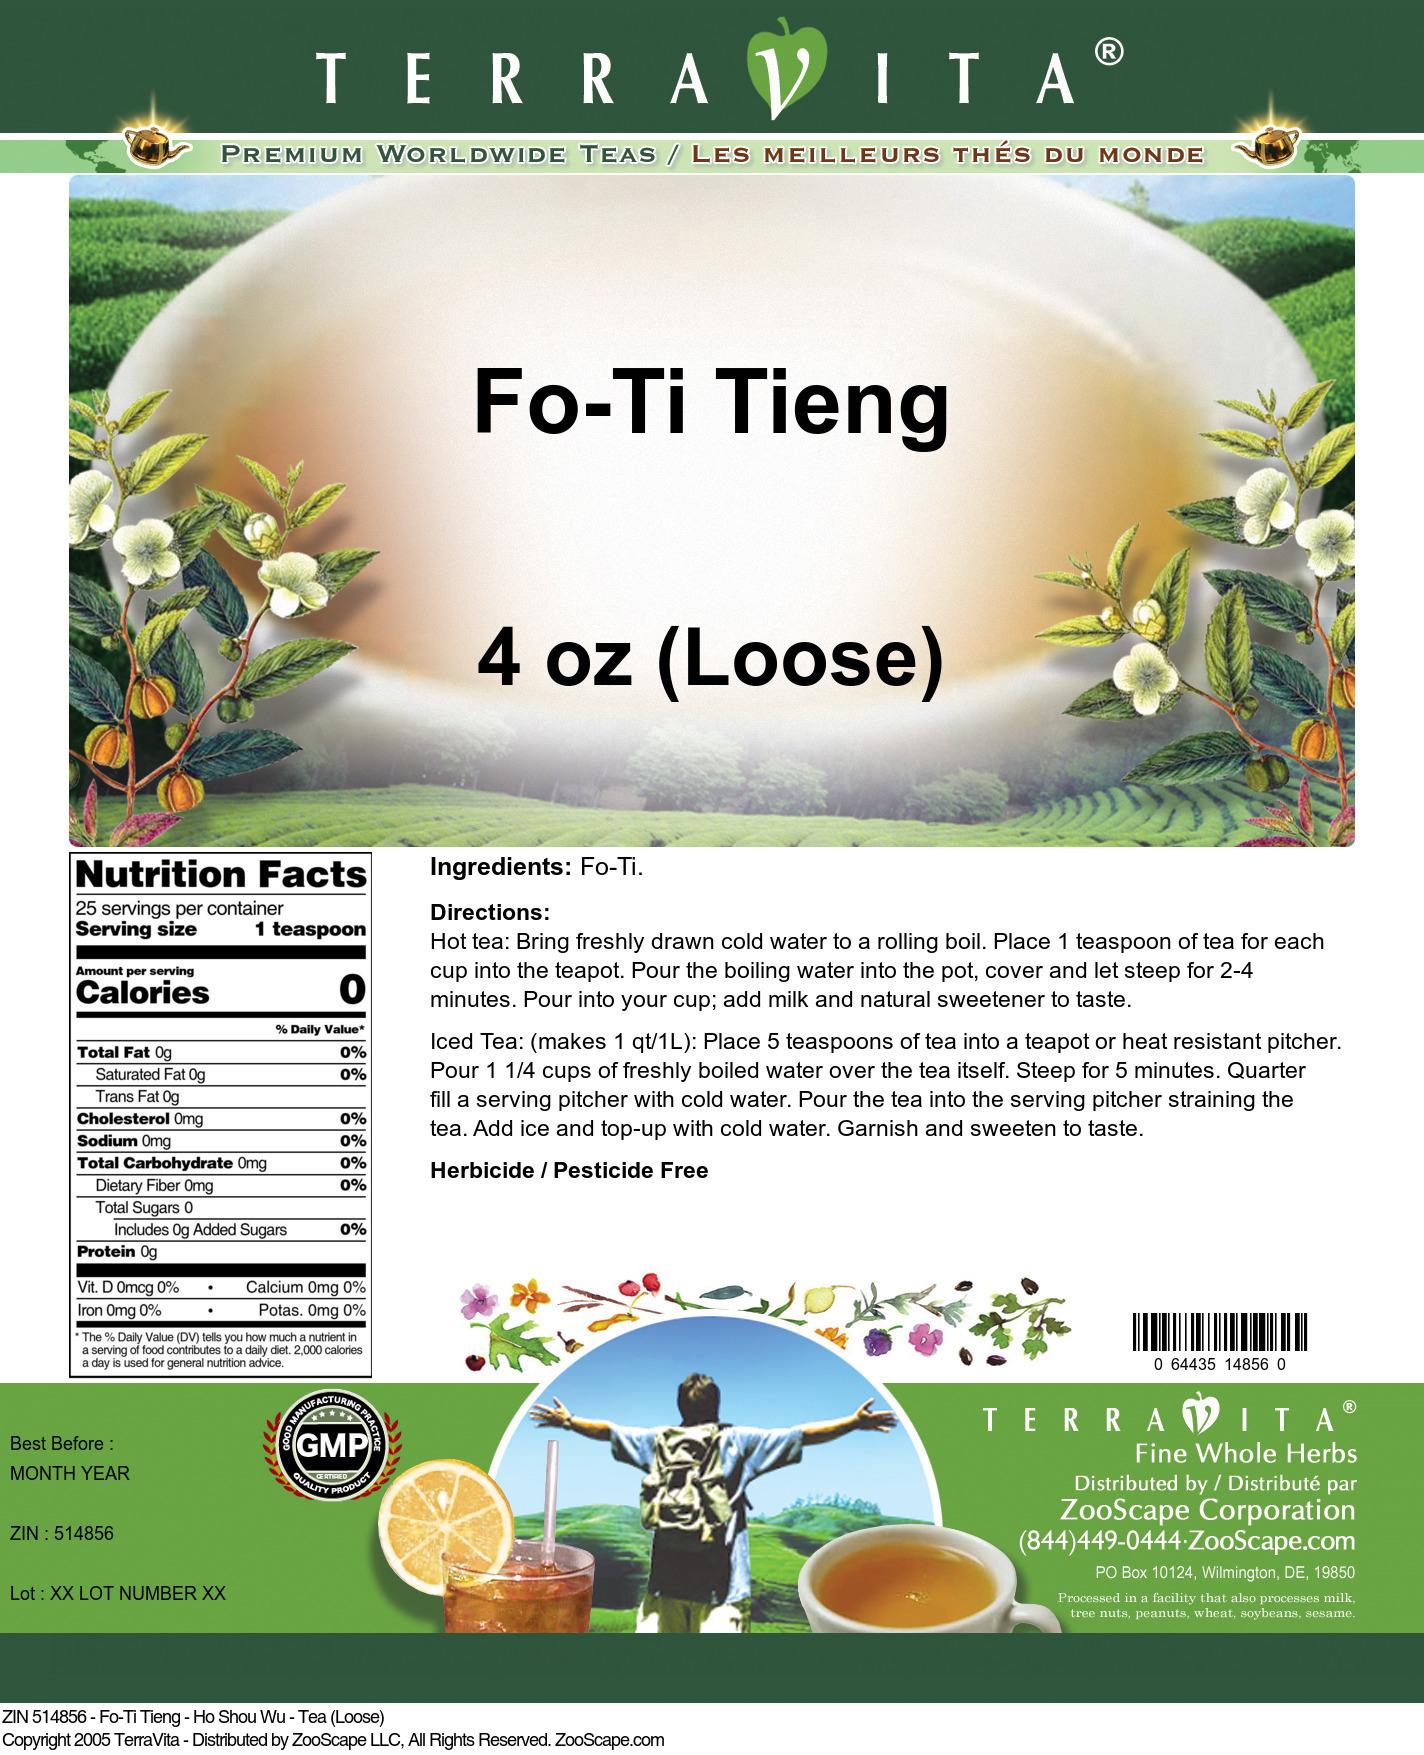 Fo-Ti Tieng - Ho Shou Wu - Tea (Loose)